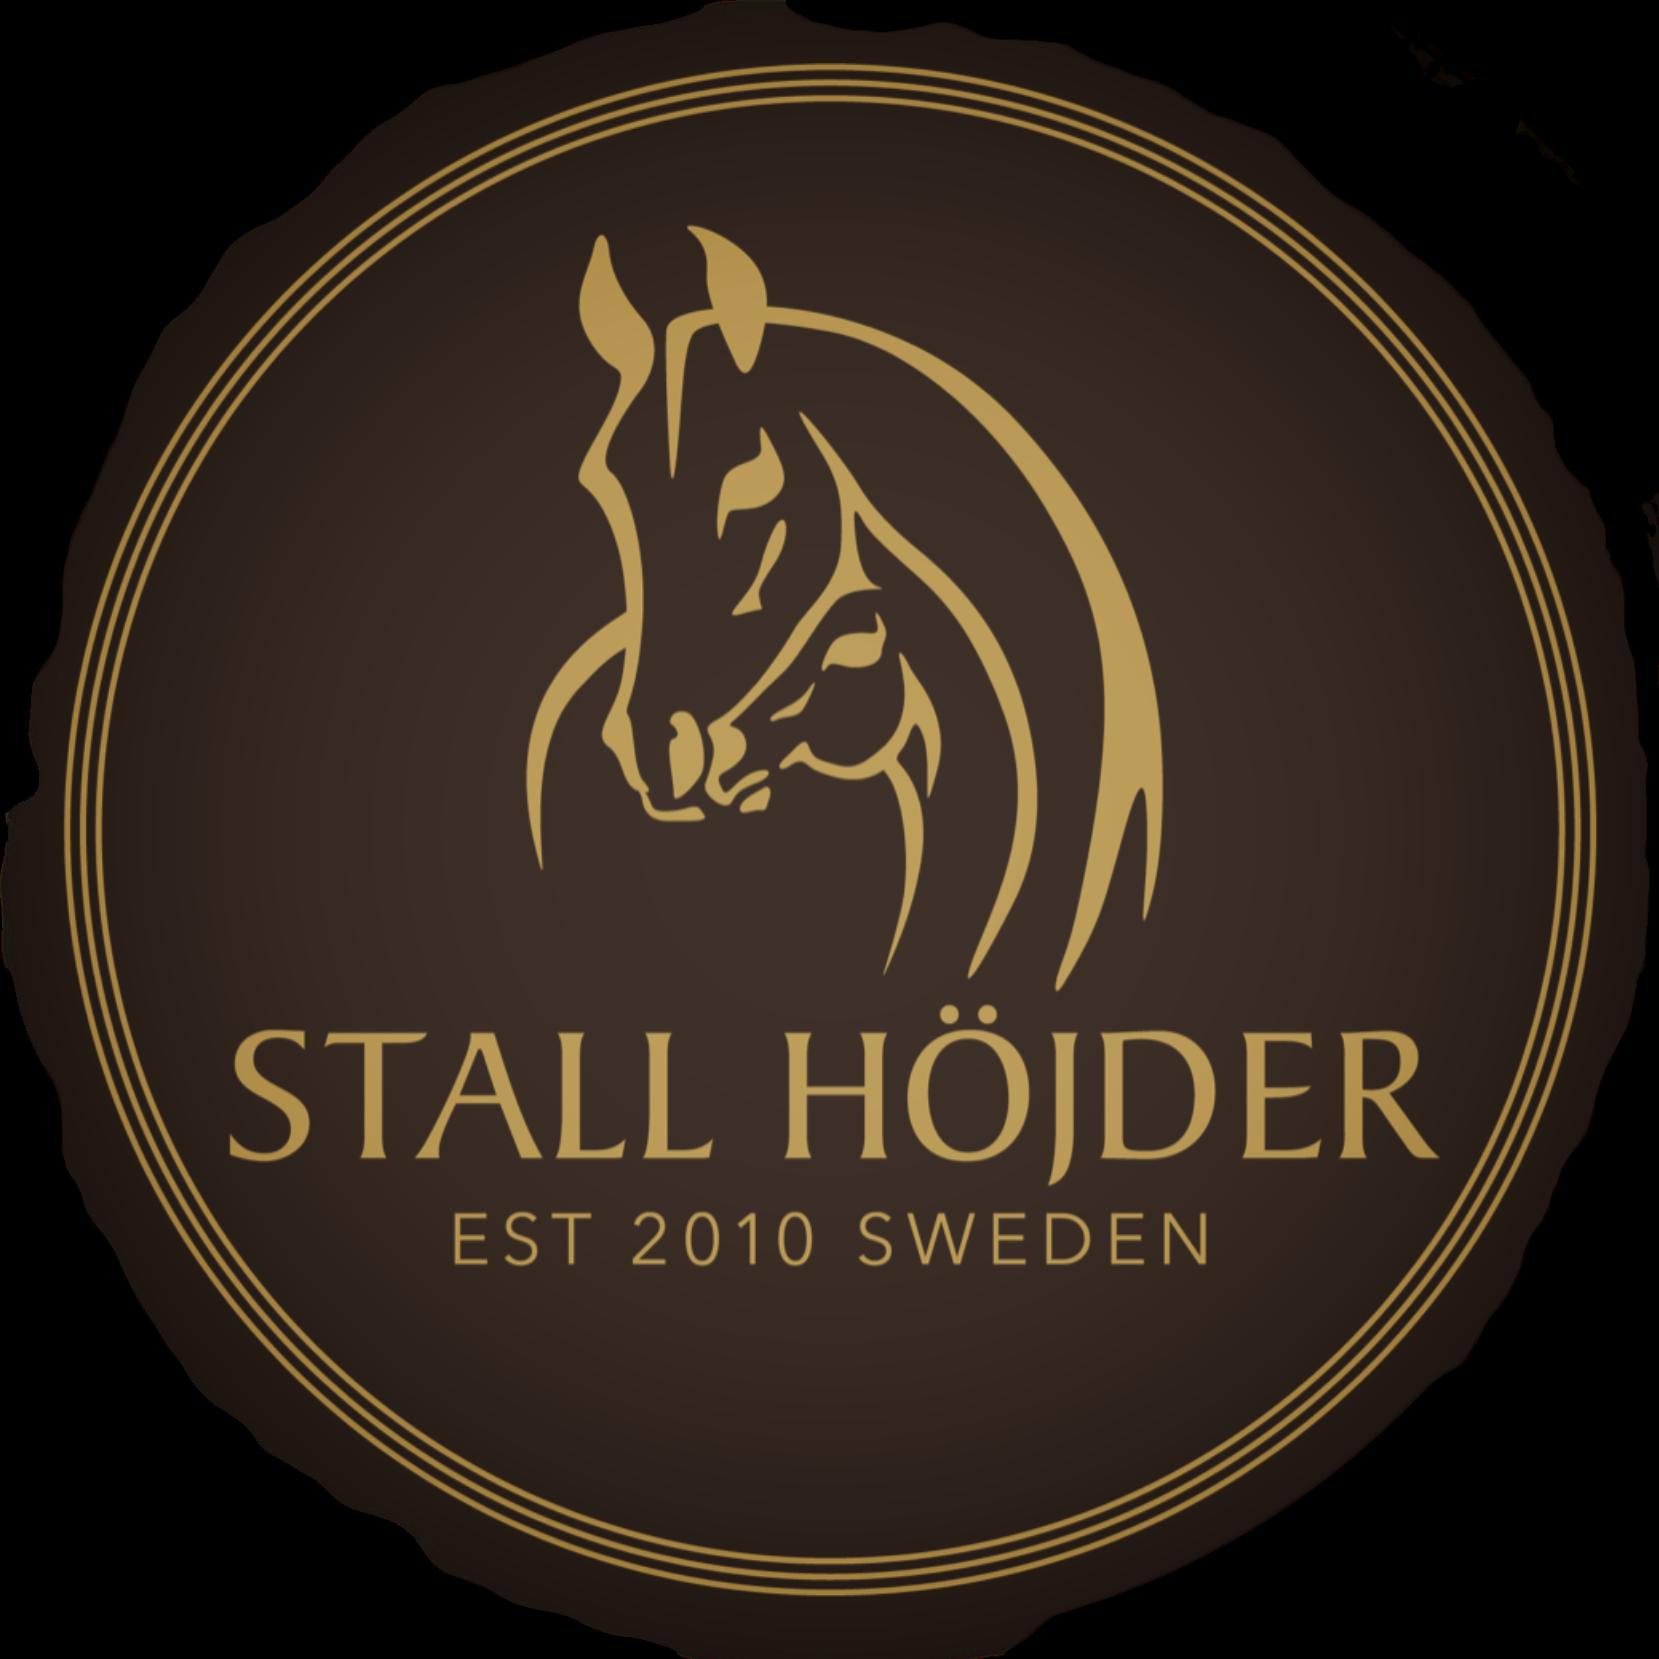 Stall Höjder